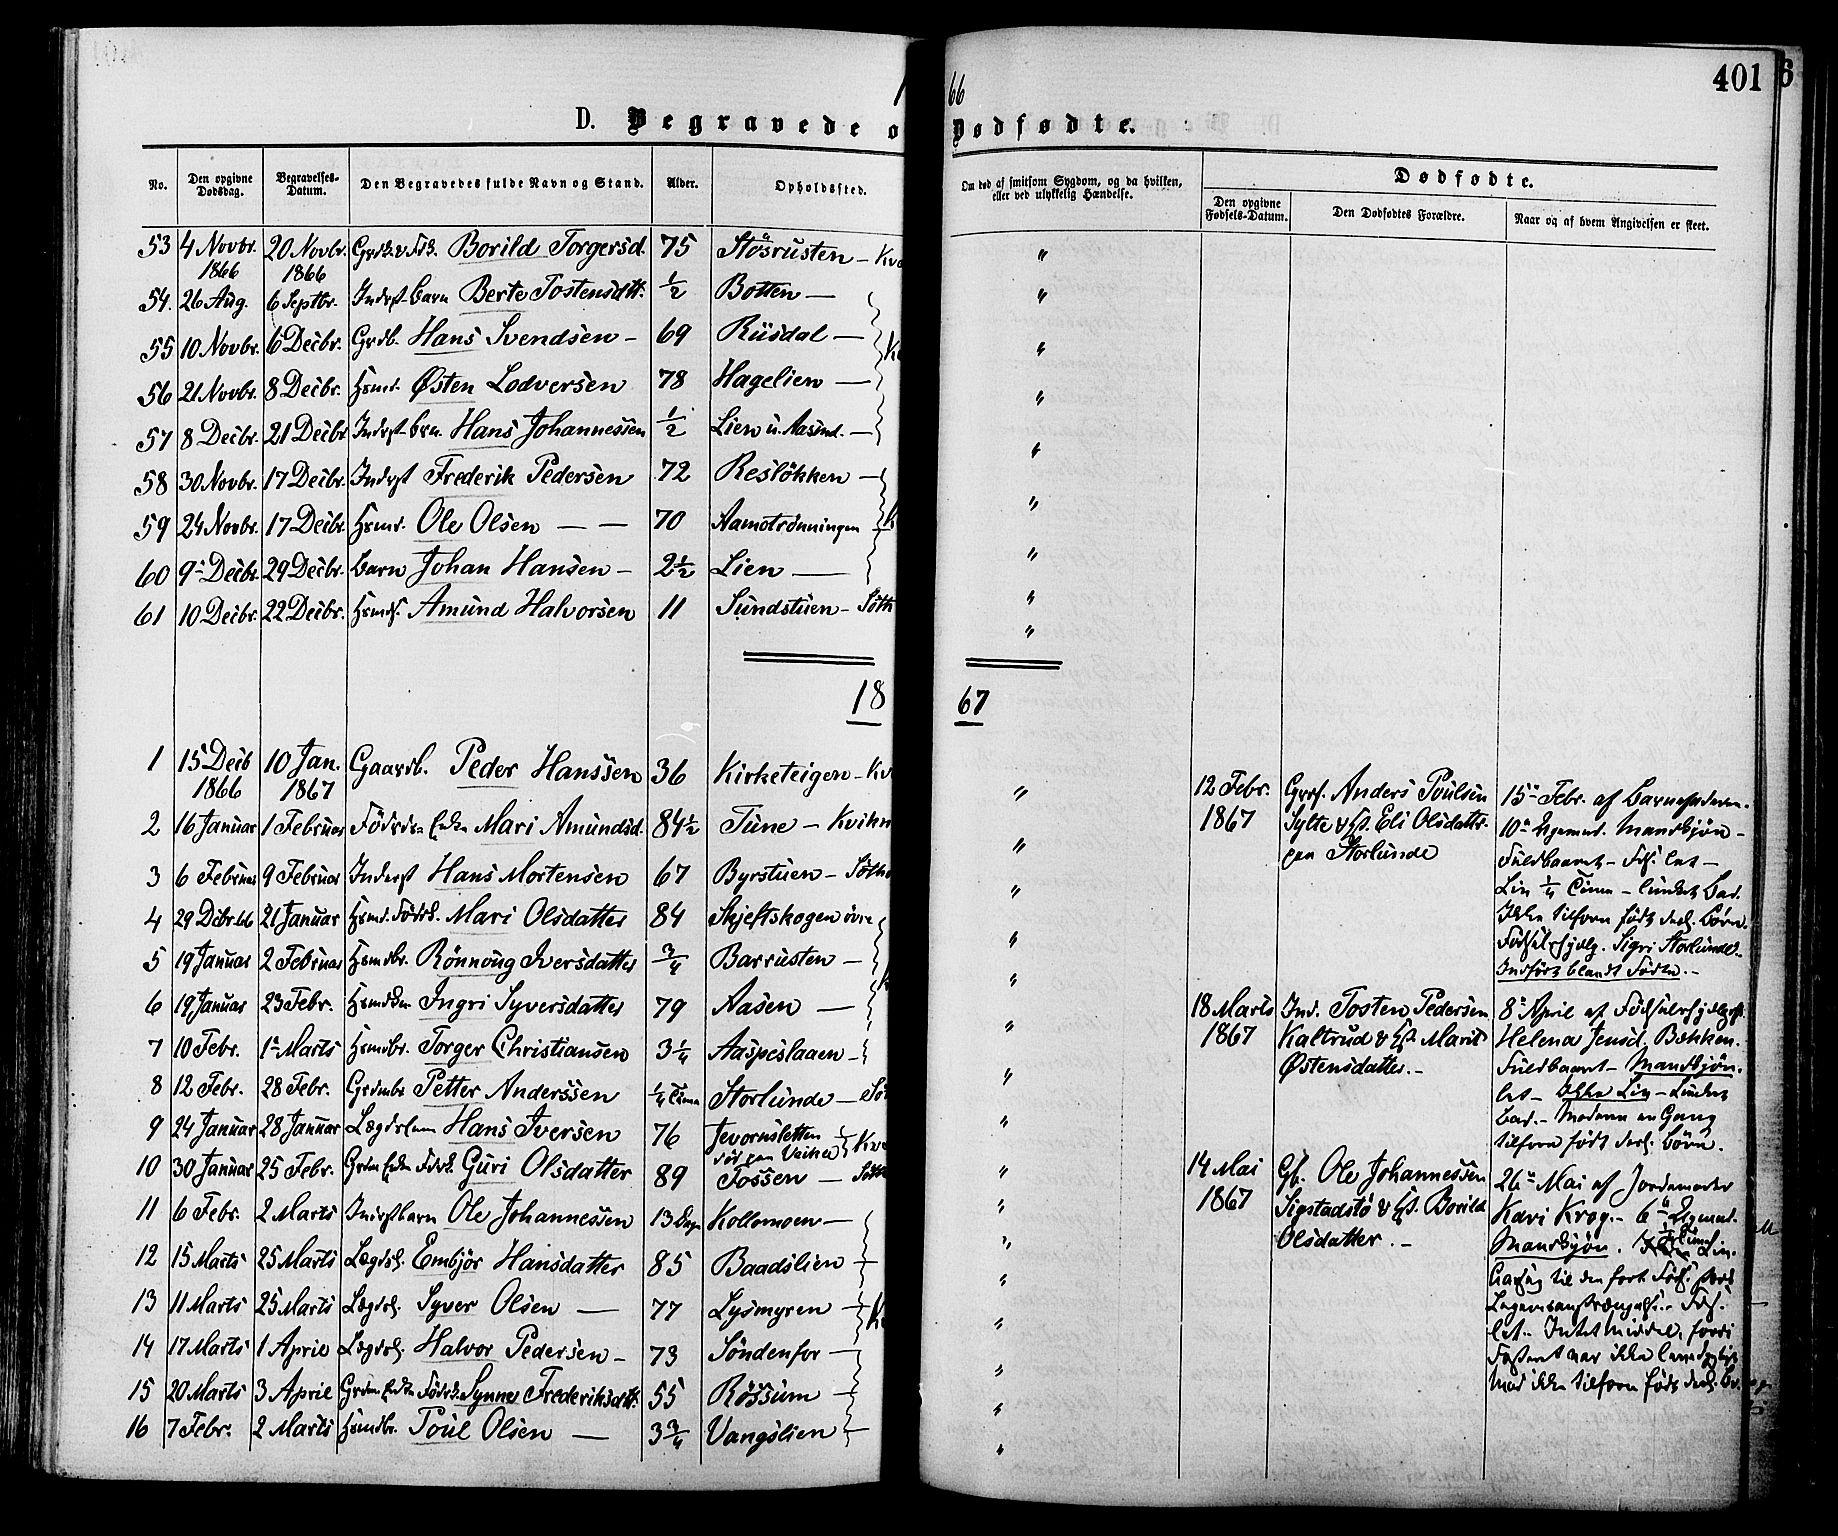 SAH, Nord-Fron prestekontor, Ministerialbok nr. 2, 1865-1883, s. 401